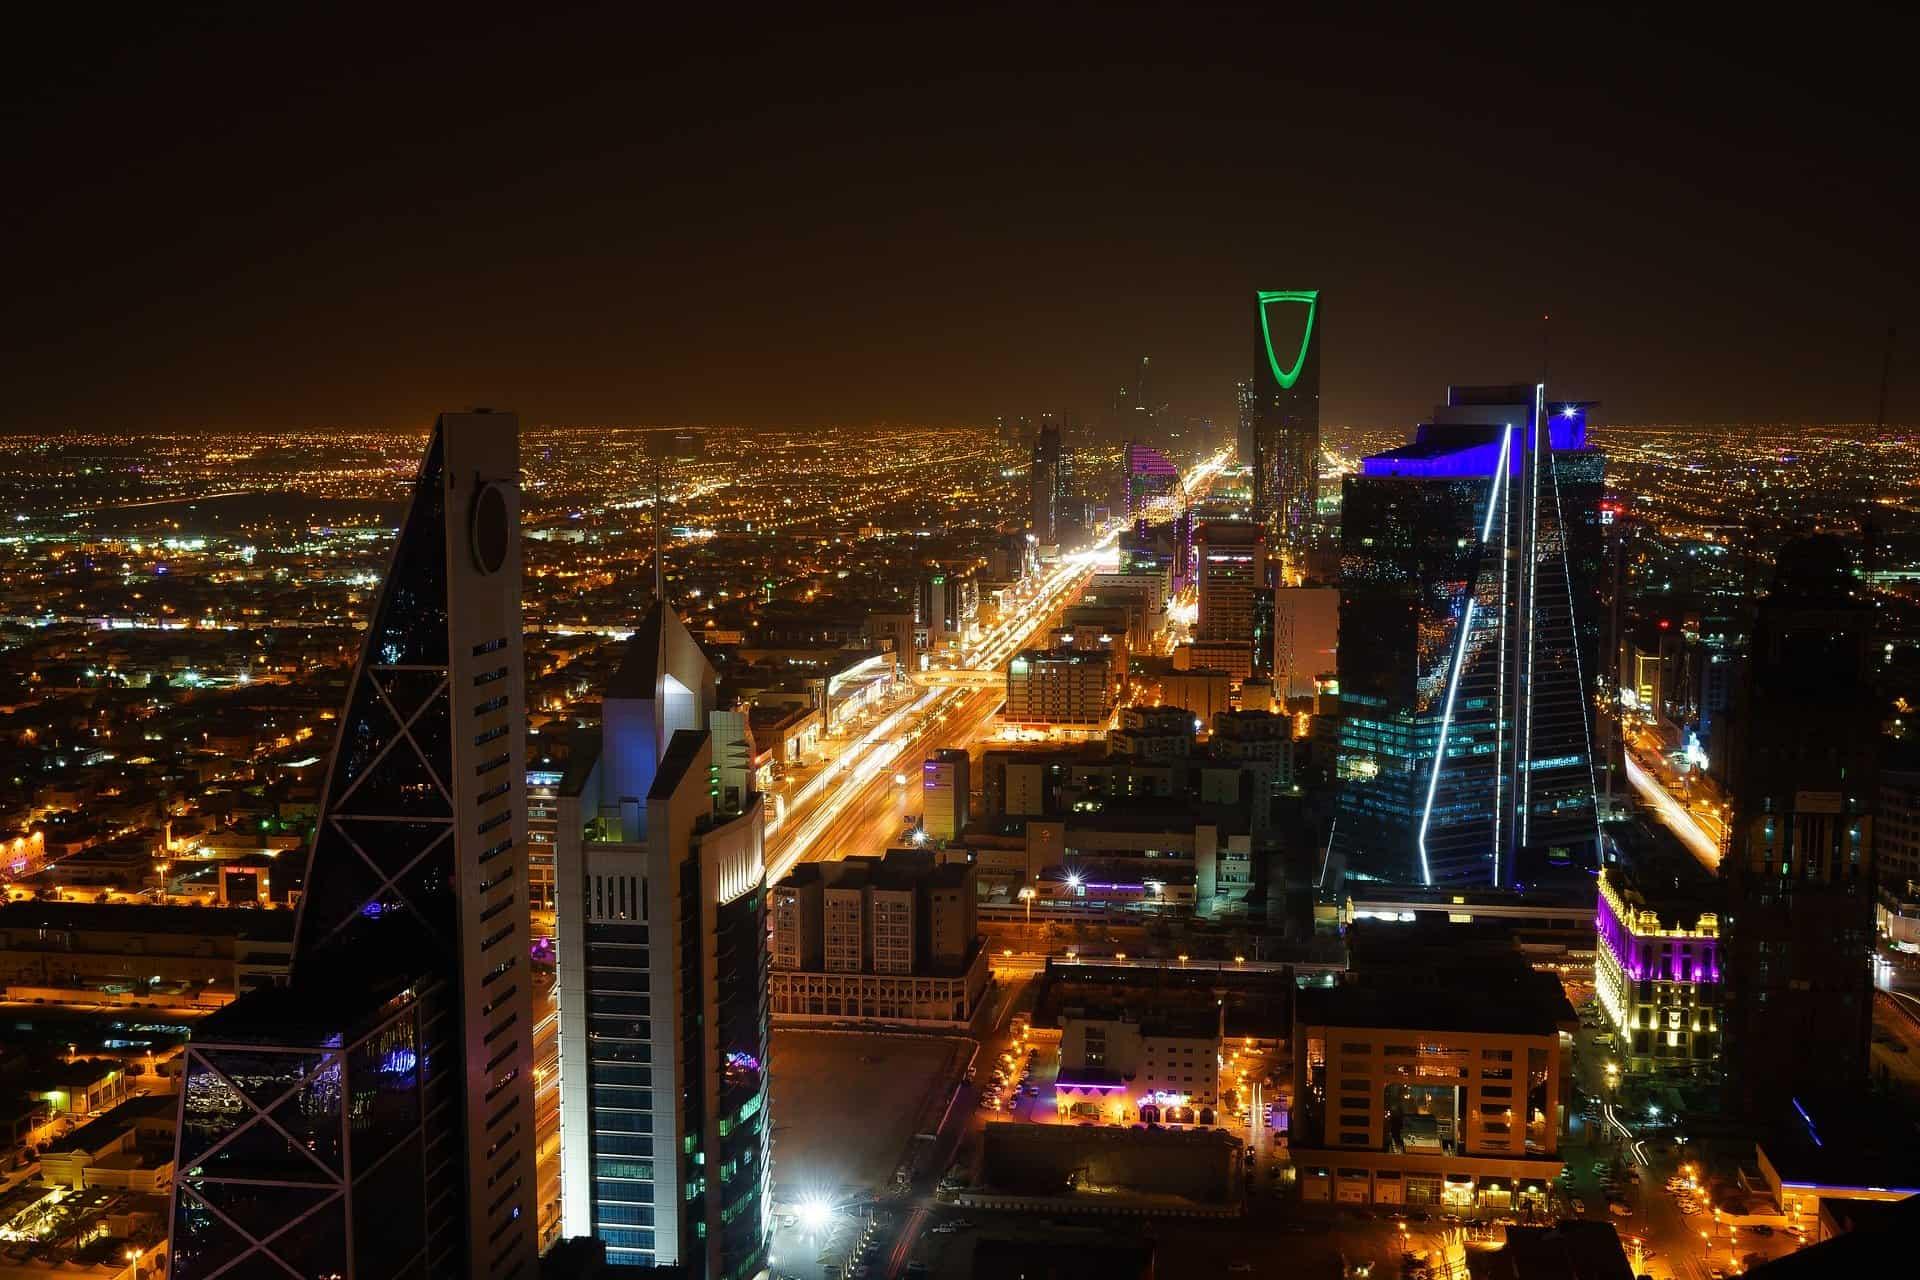 Night time view of Saudi Arabian city